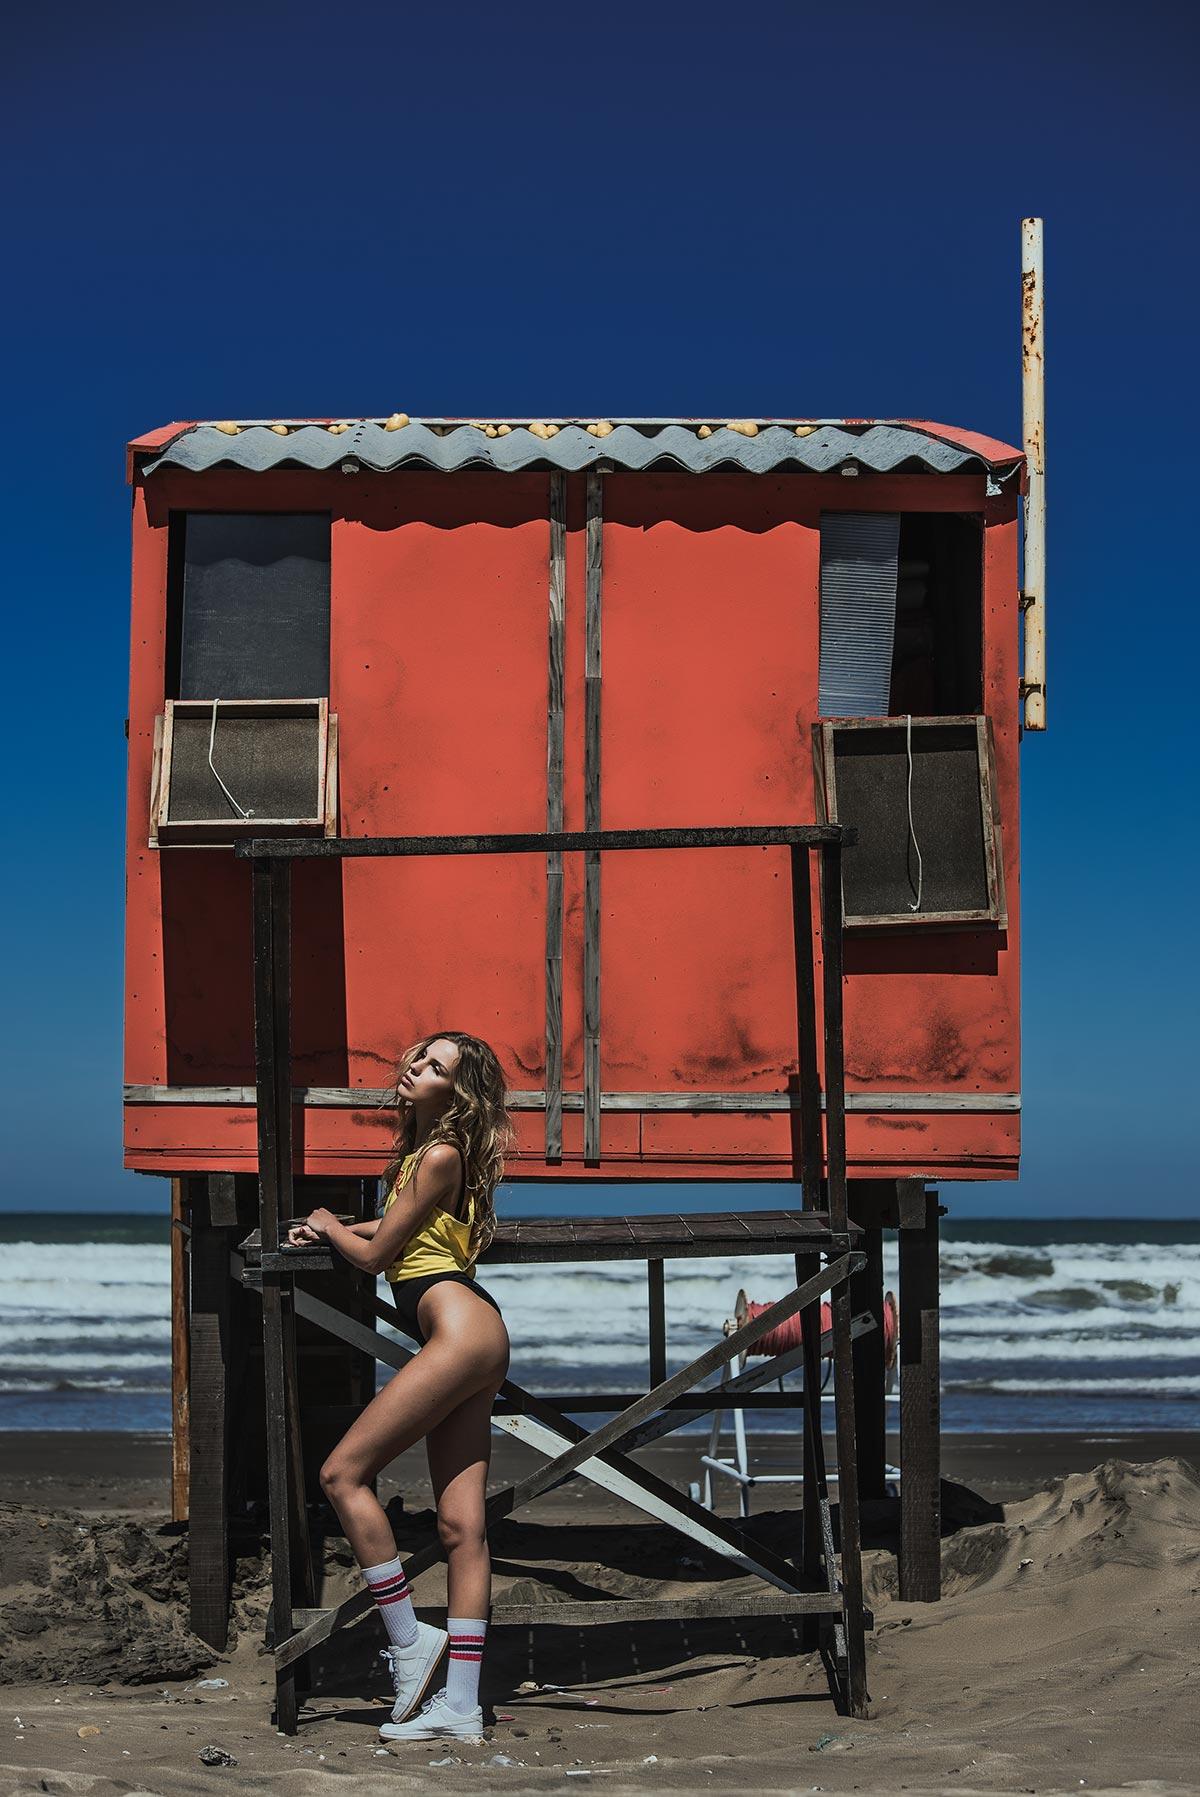 Strandatmosphäre mit Kryss Wood und Alejandro Bauducco 11